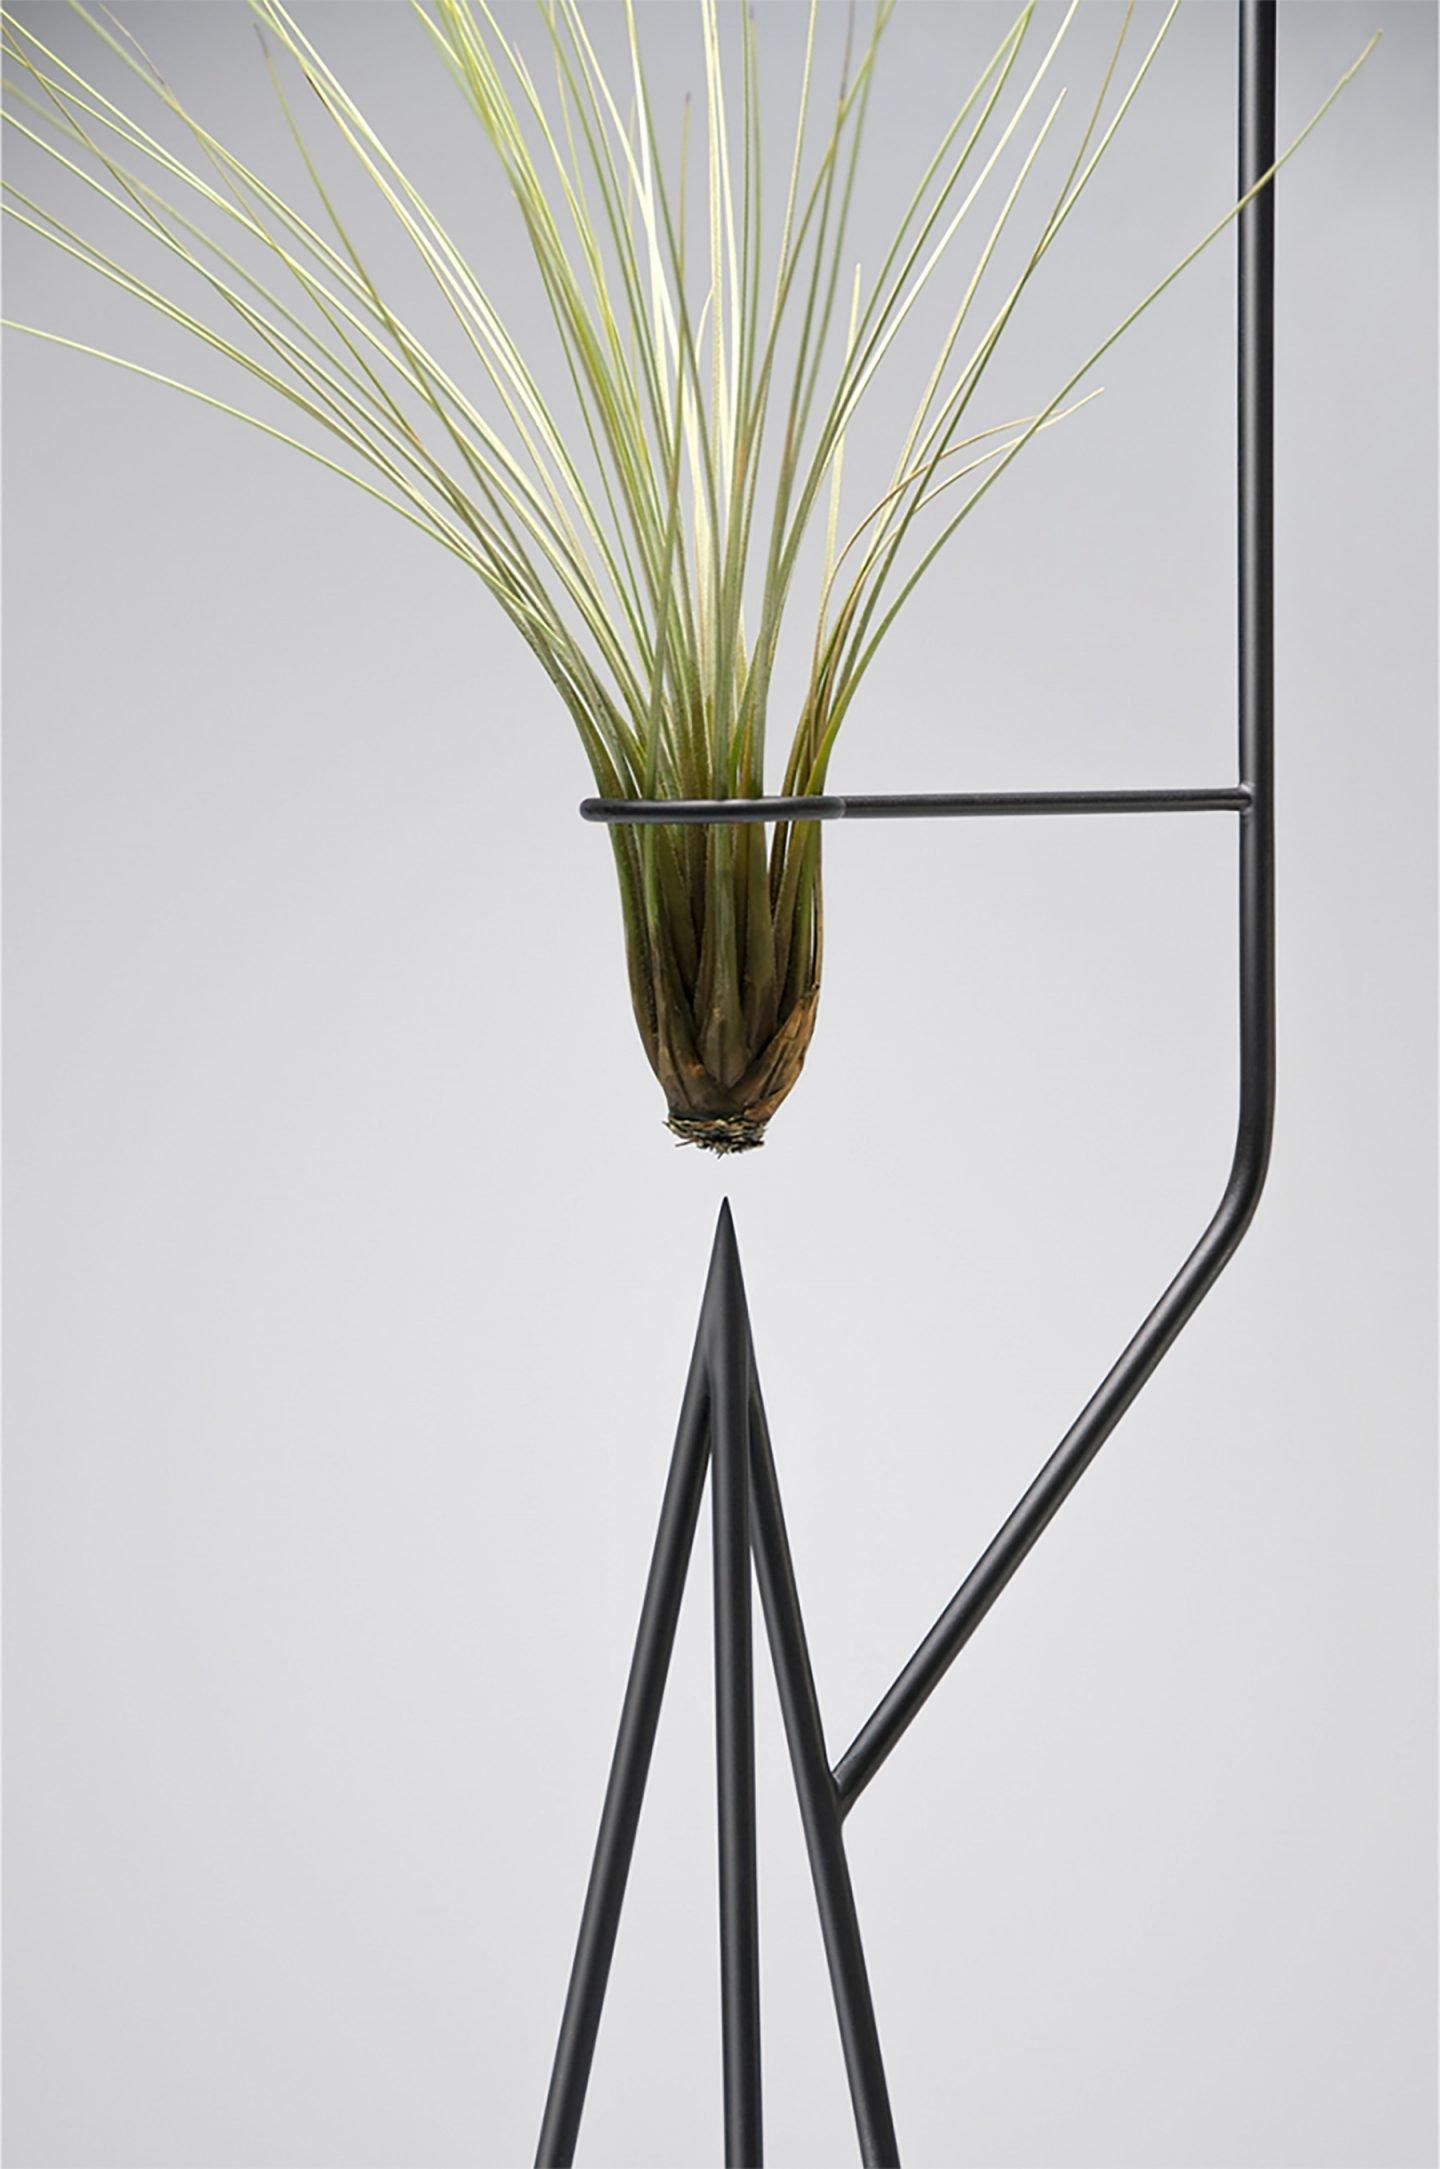 iGNANT-Design-Goula-Figuera-Viride-07 copy